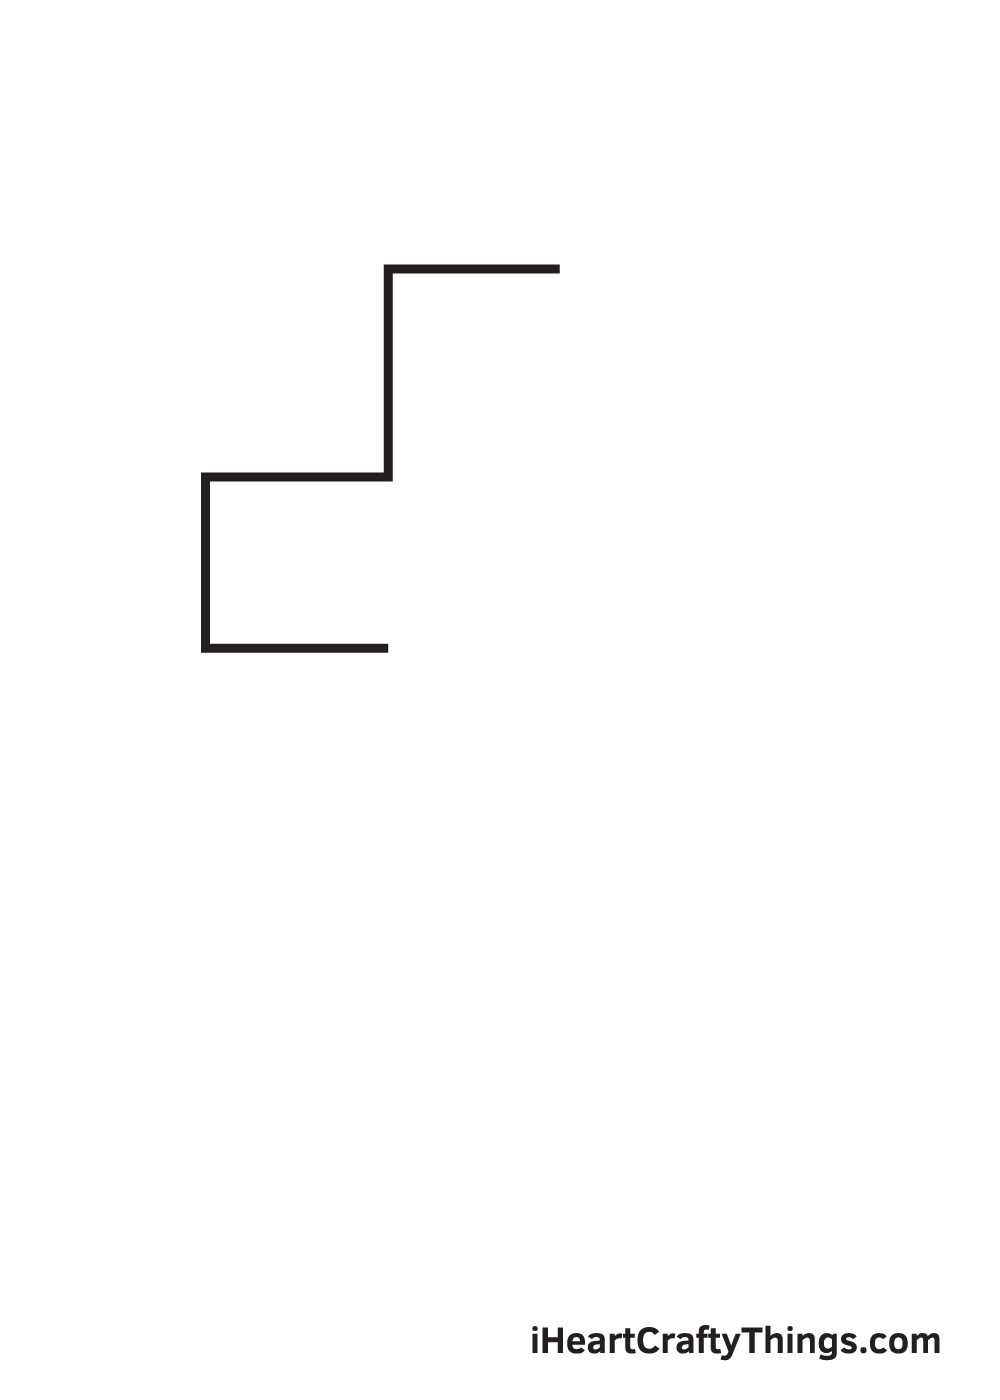 cross drawing - step 2